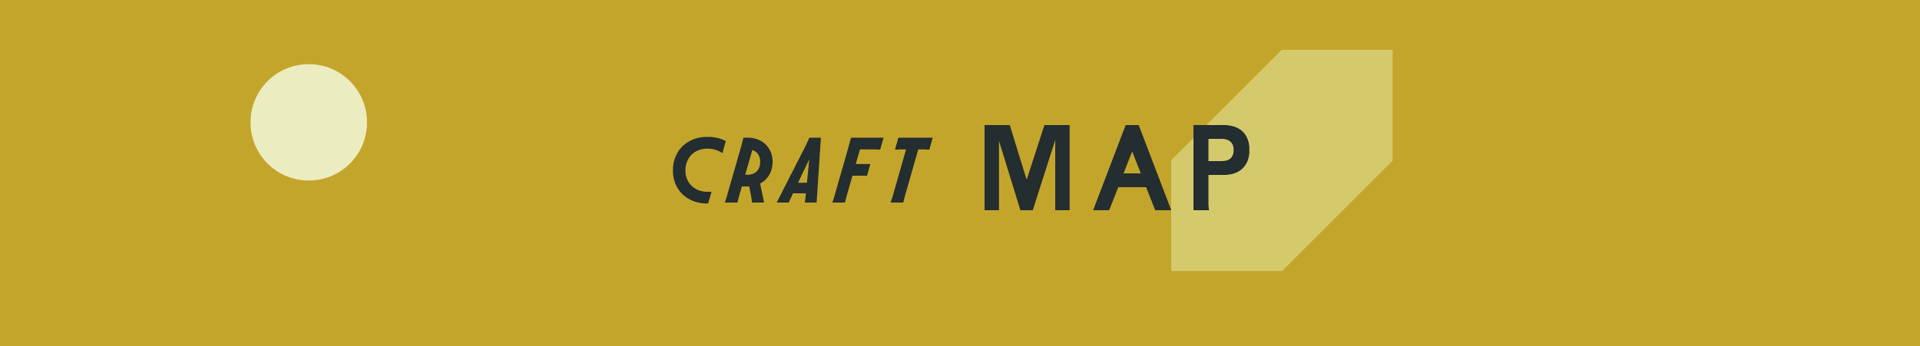 Craft Map